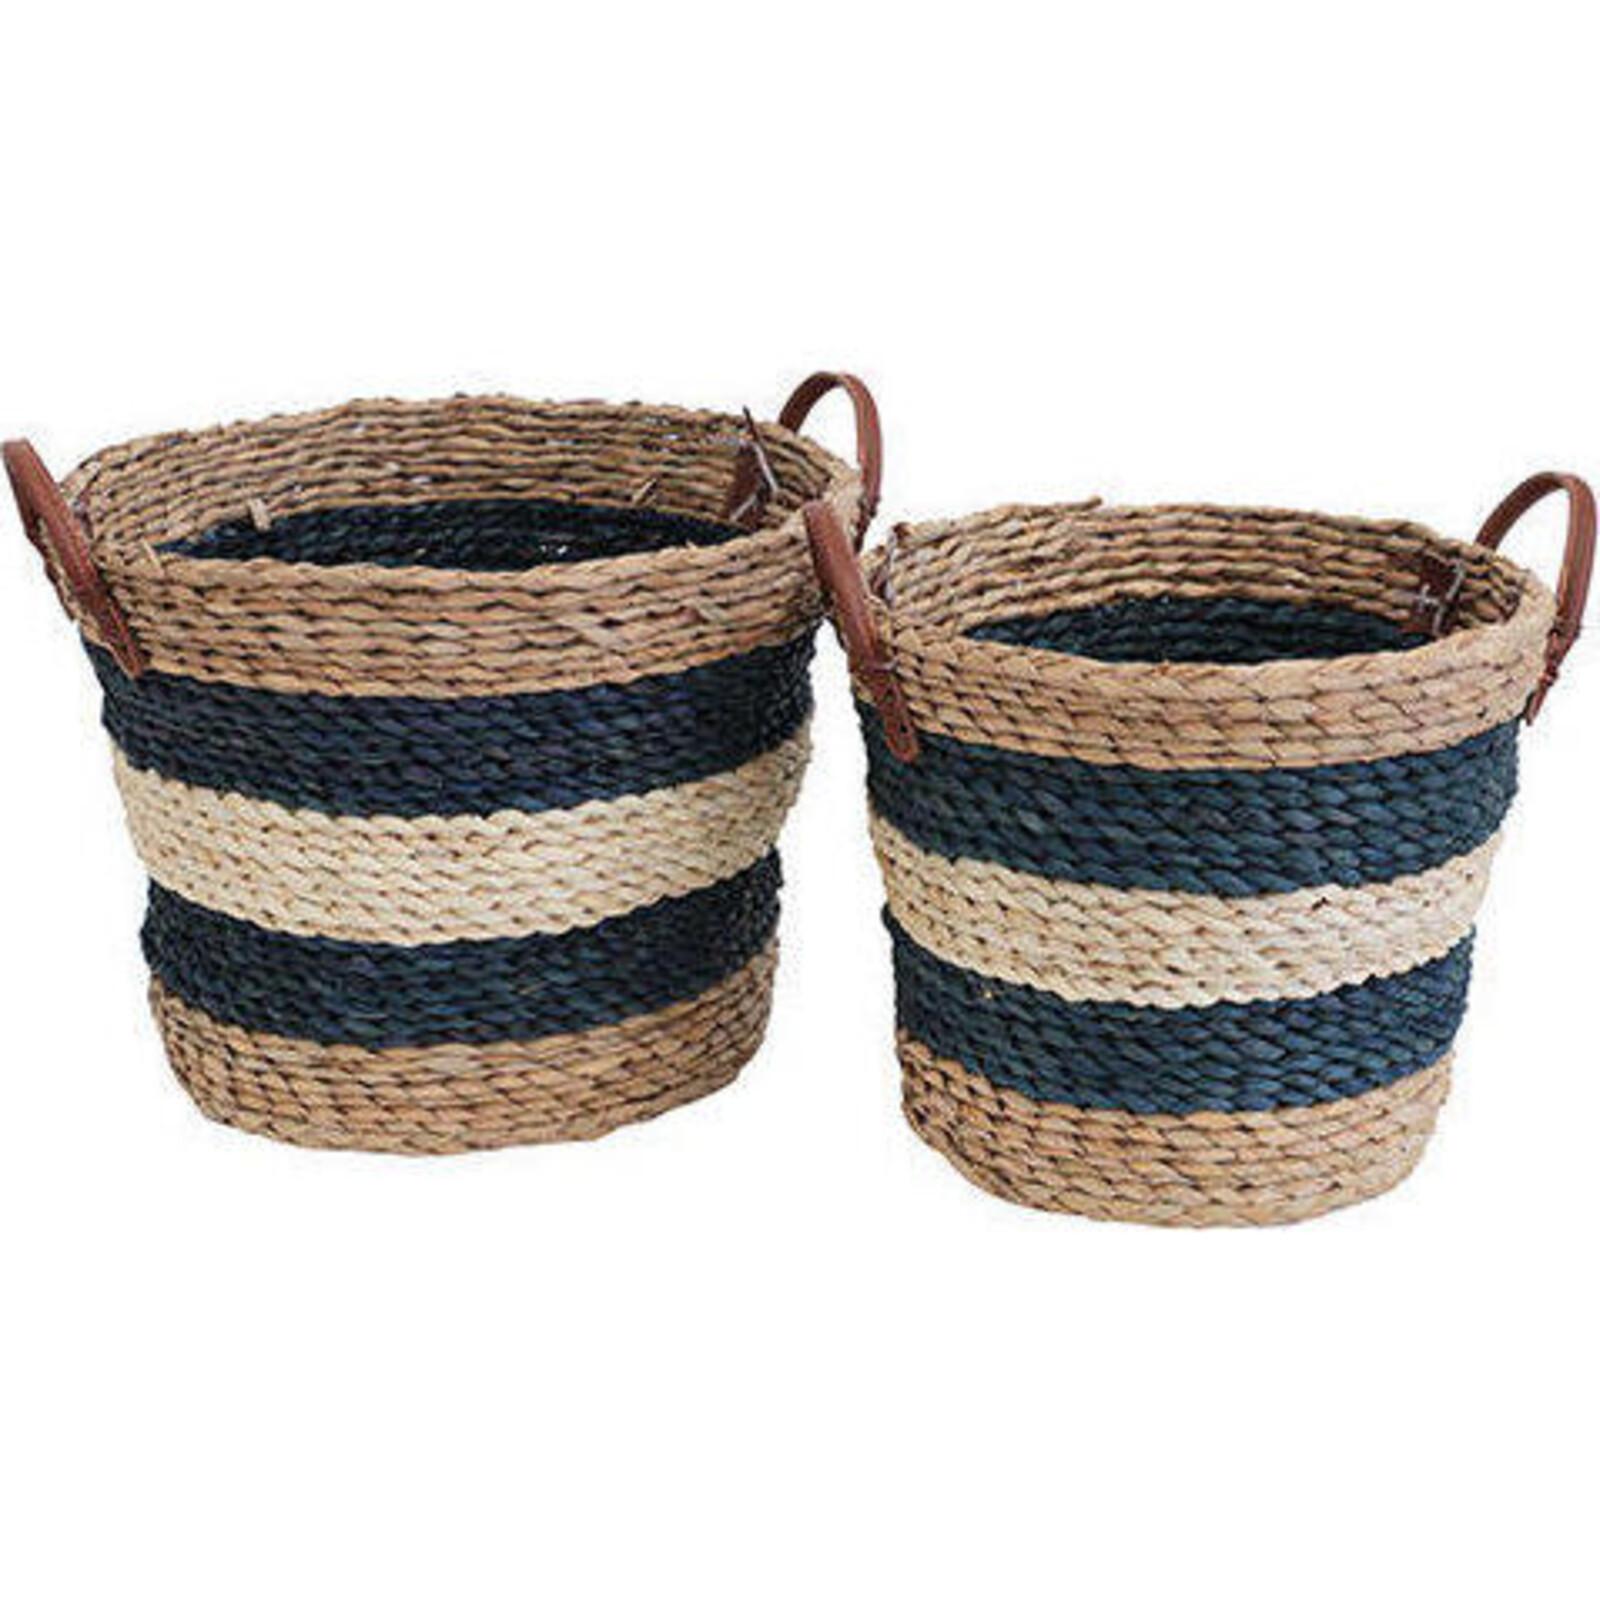 Tub Basket Double Navy S/2